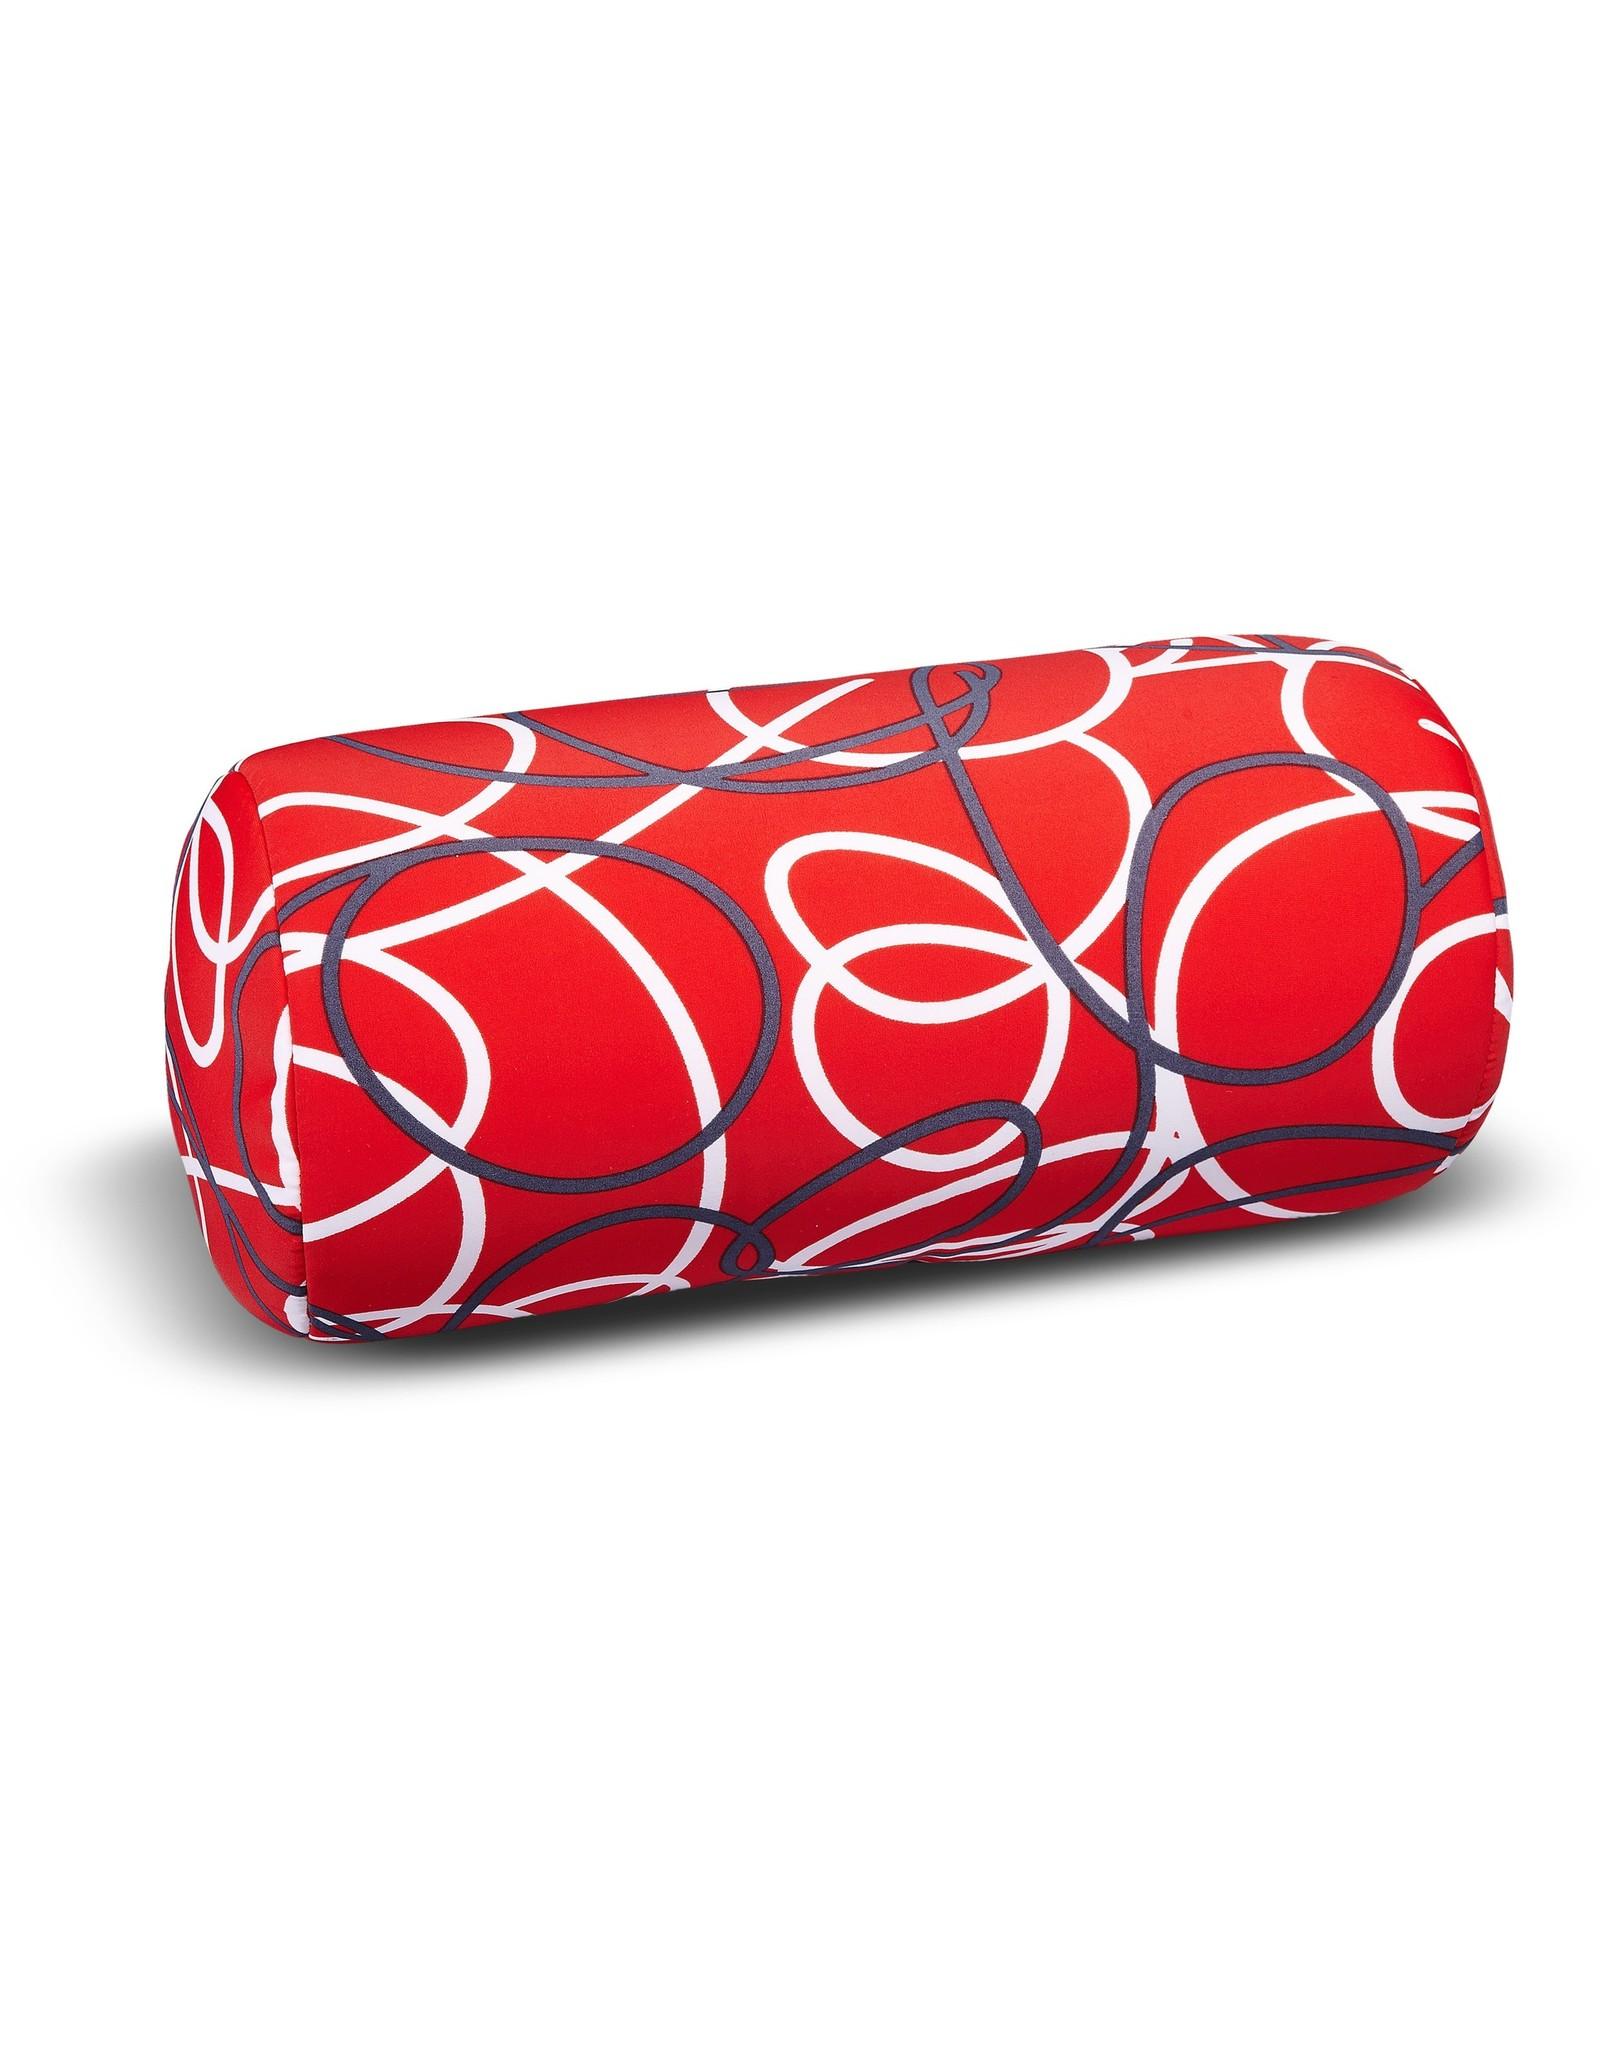 Kuschel-Maxx Cover Kuschel-Maxx - Linien Rot